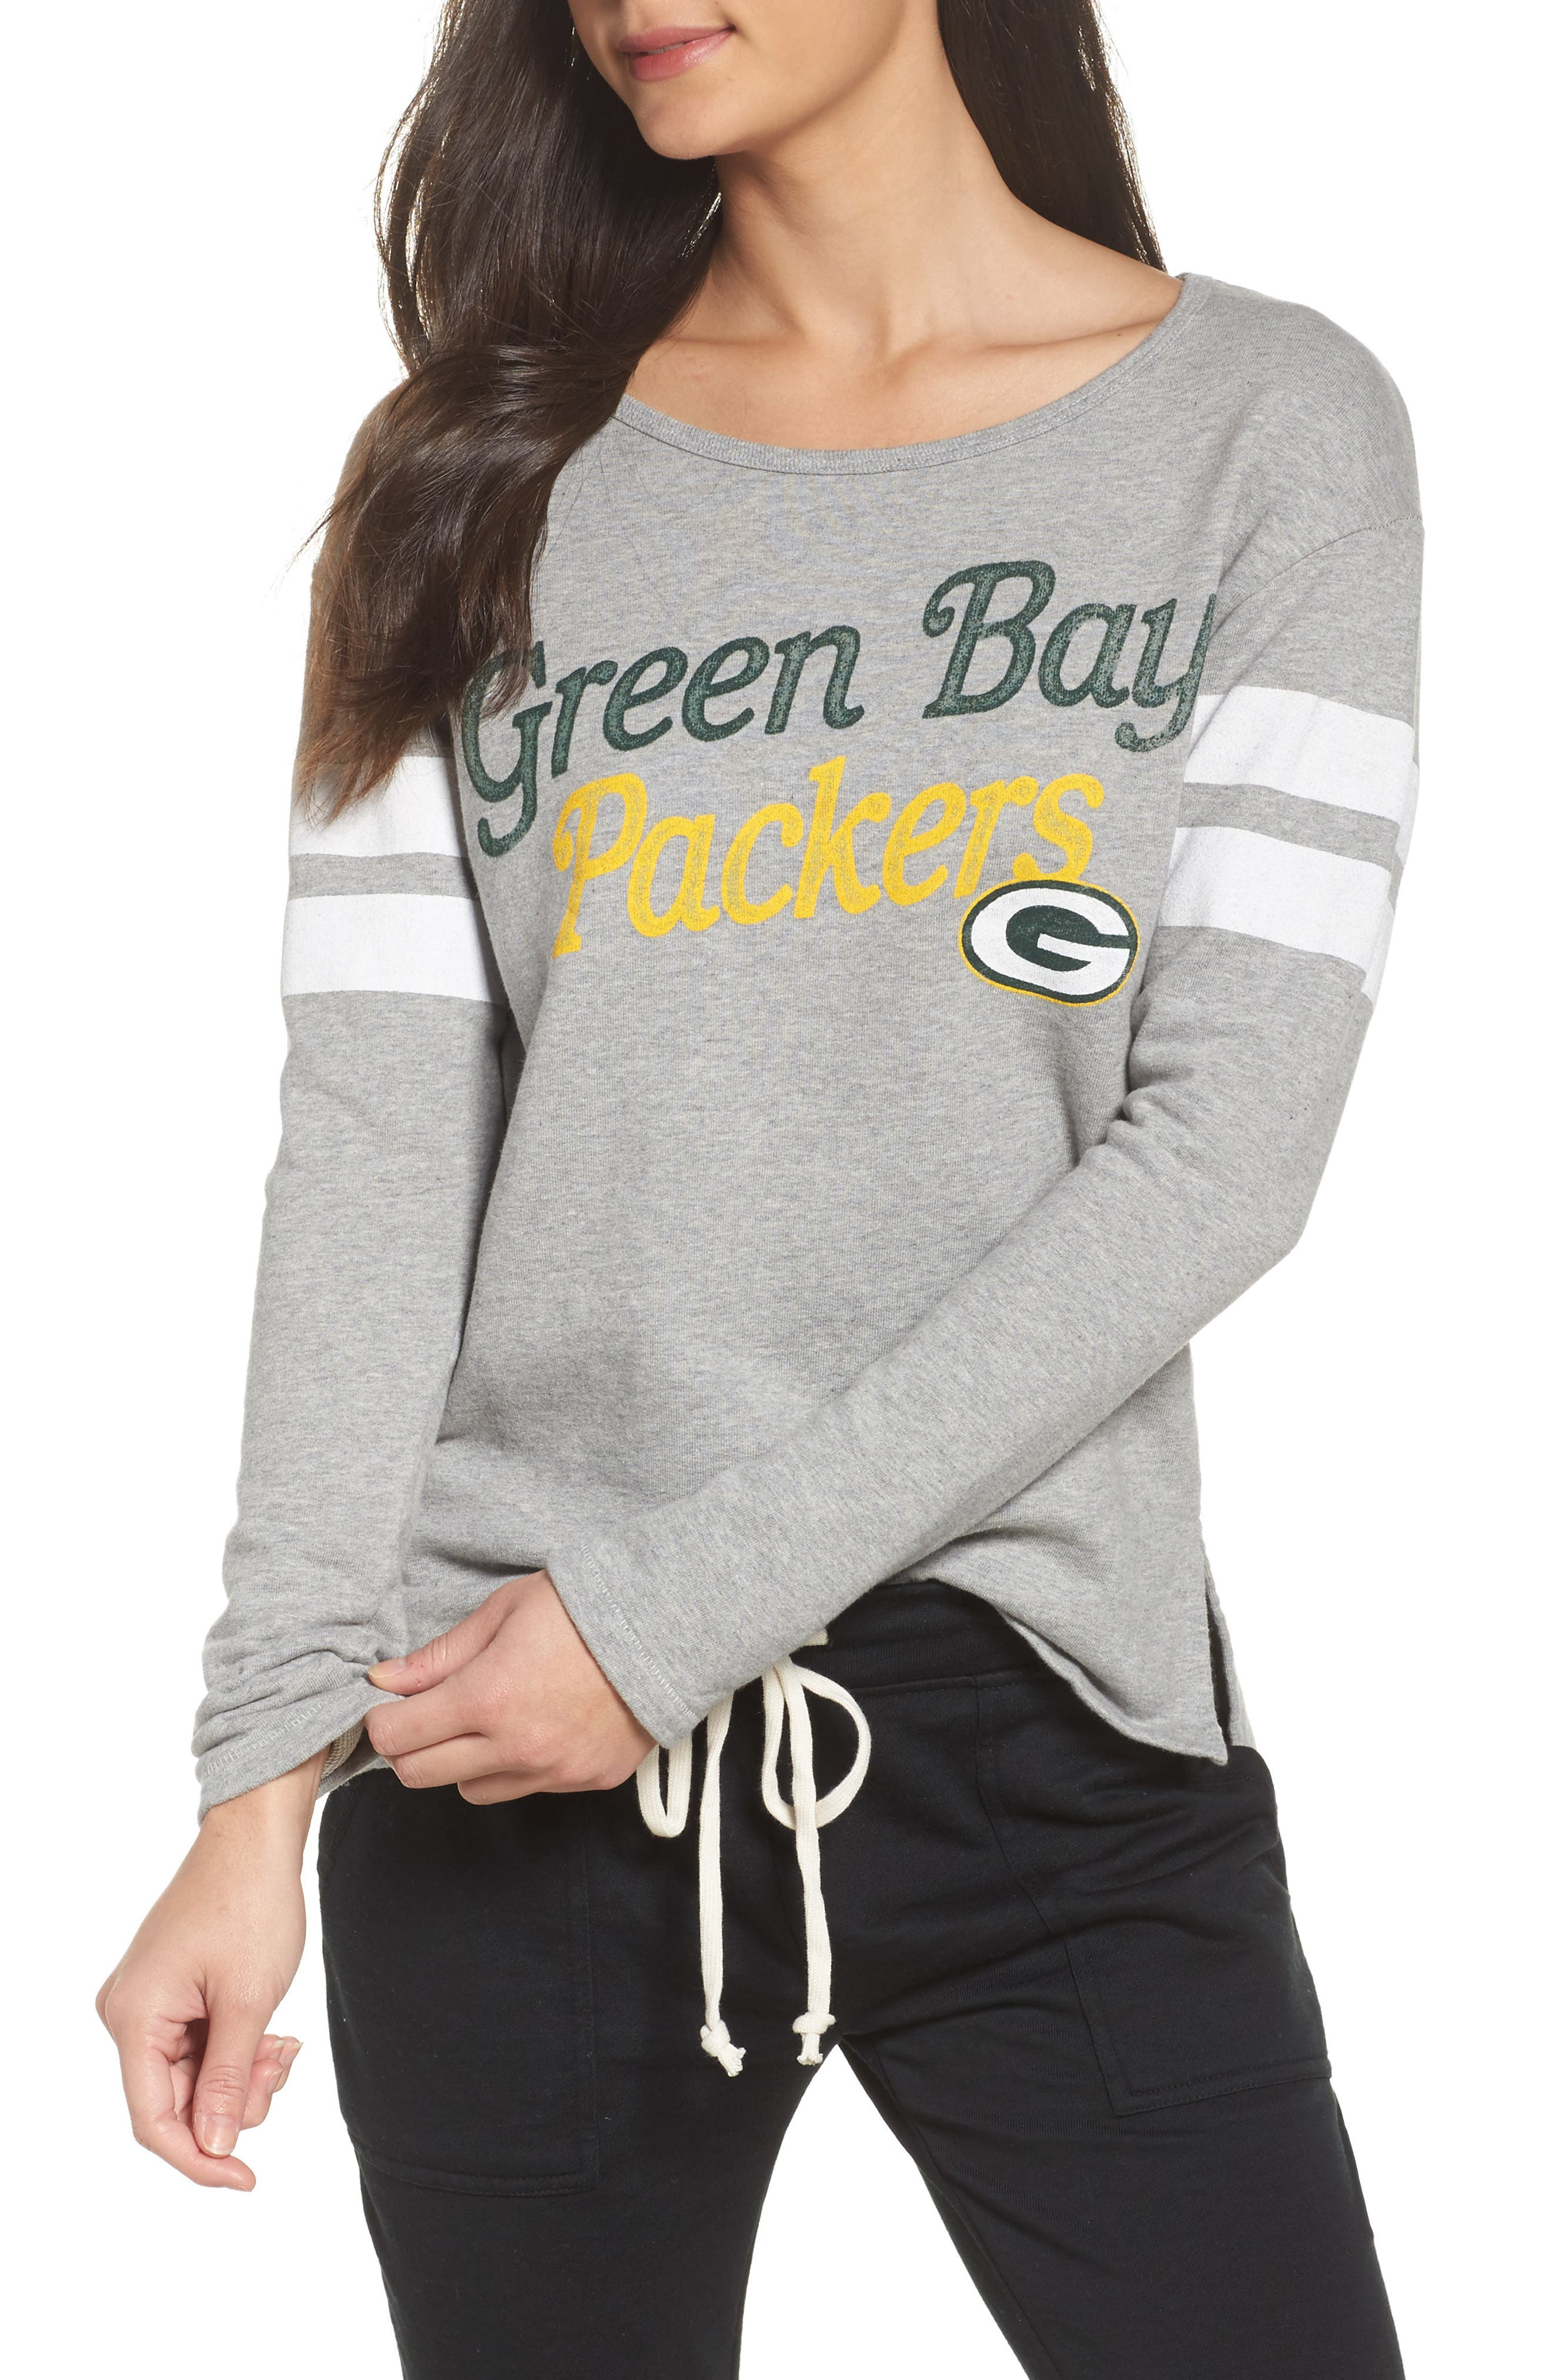 NFL Green Bay Packers Champion Sweatshirt,                             Main thumbnail 1, color,                             028